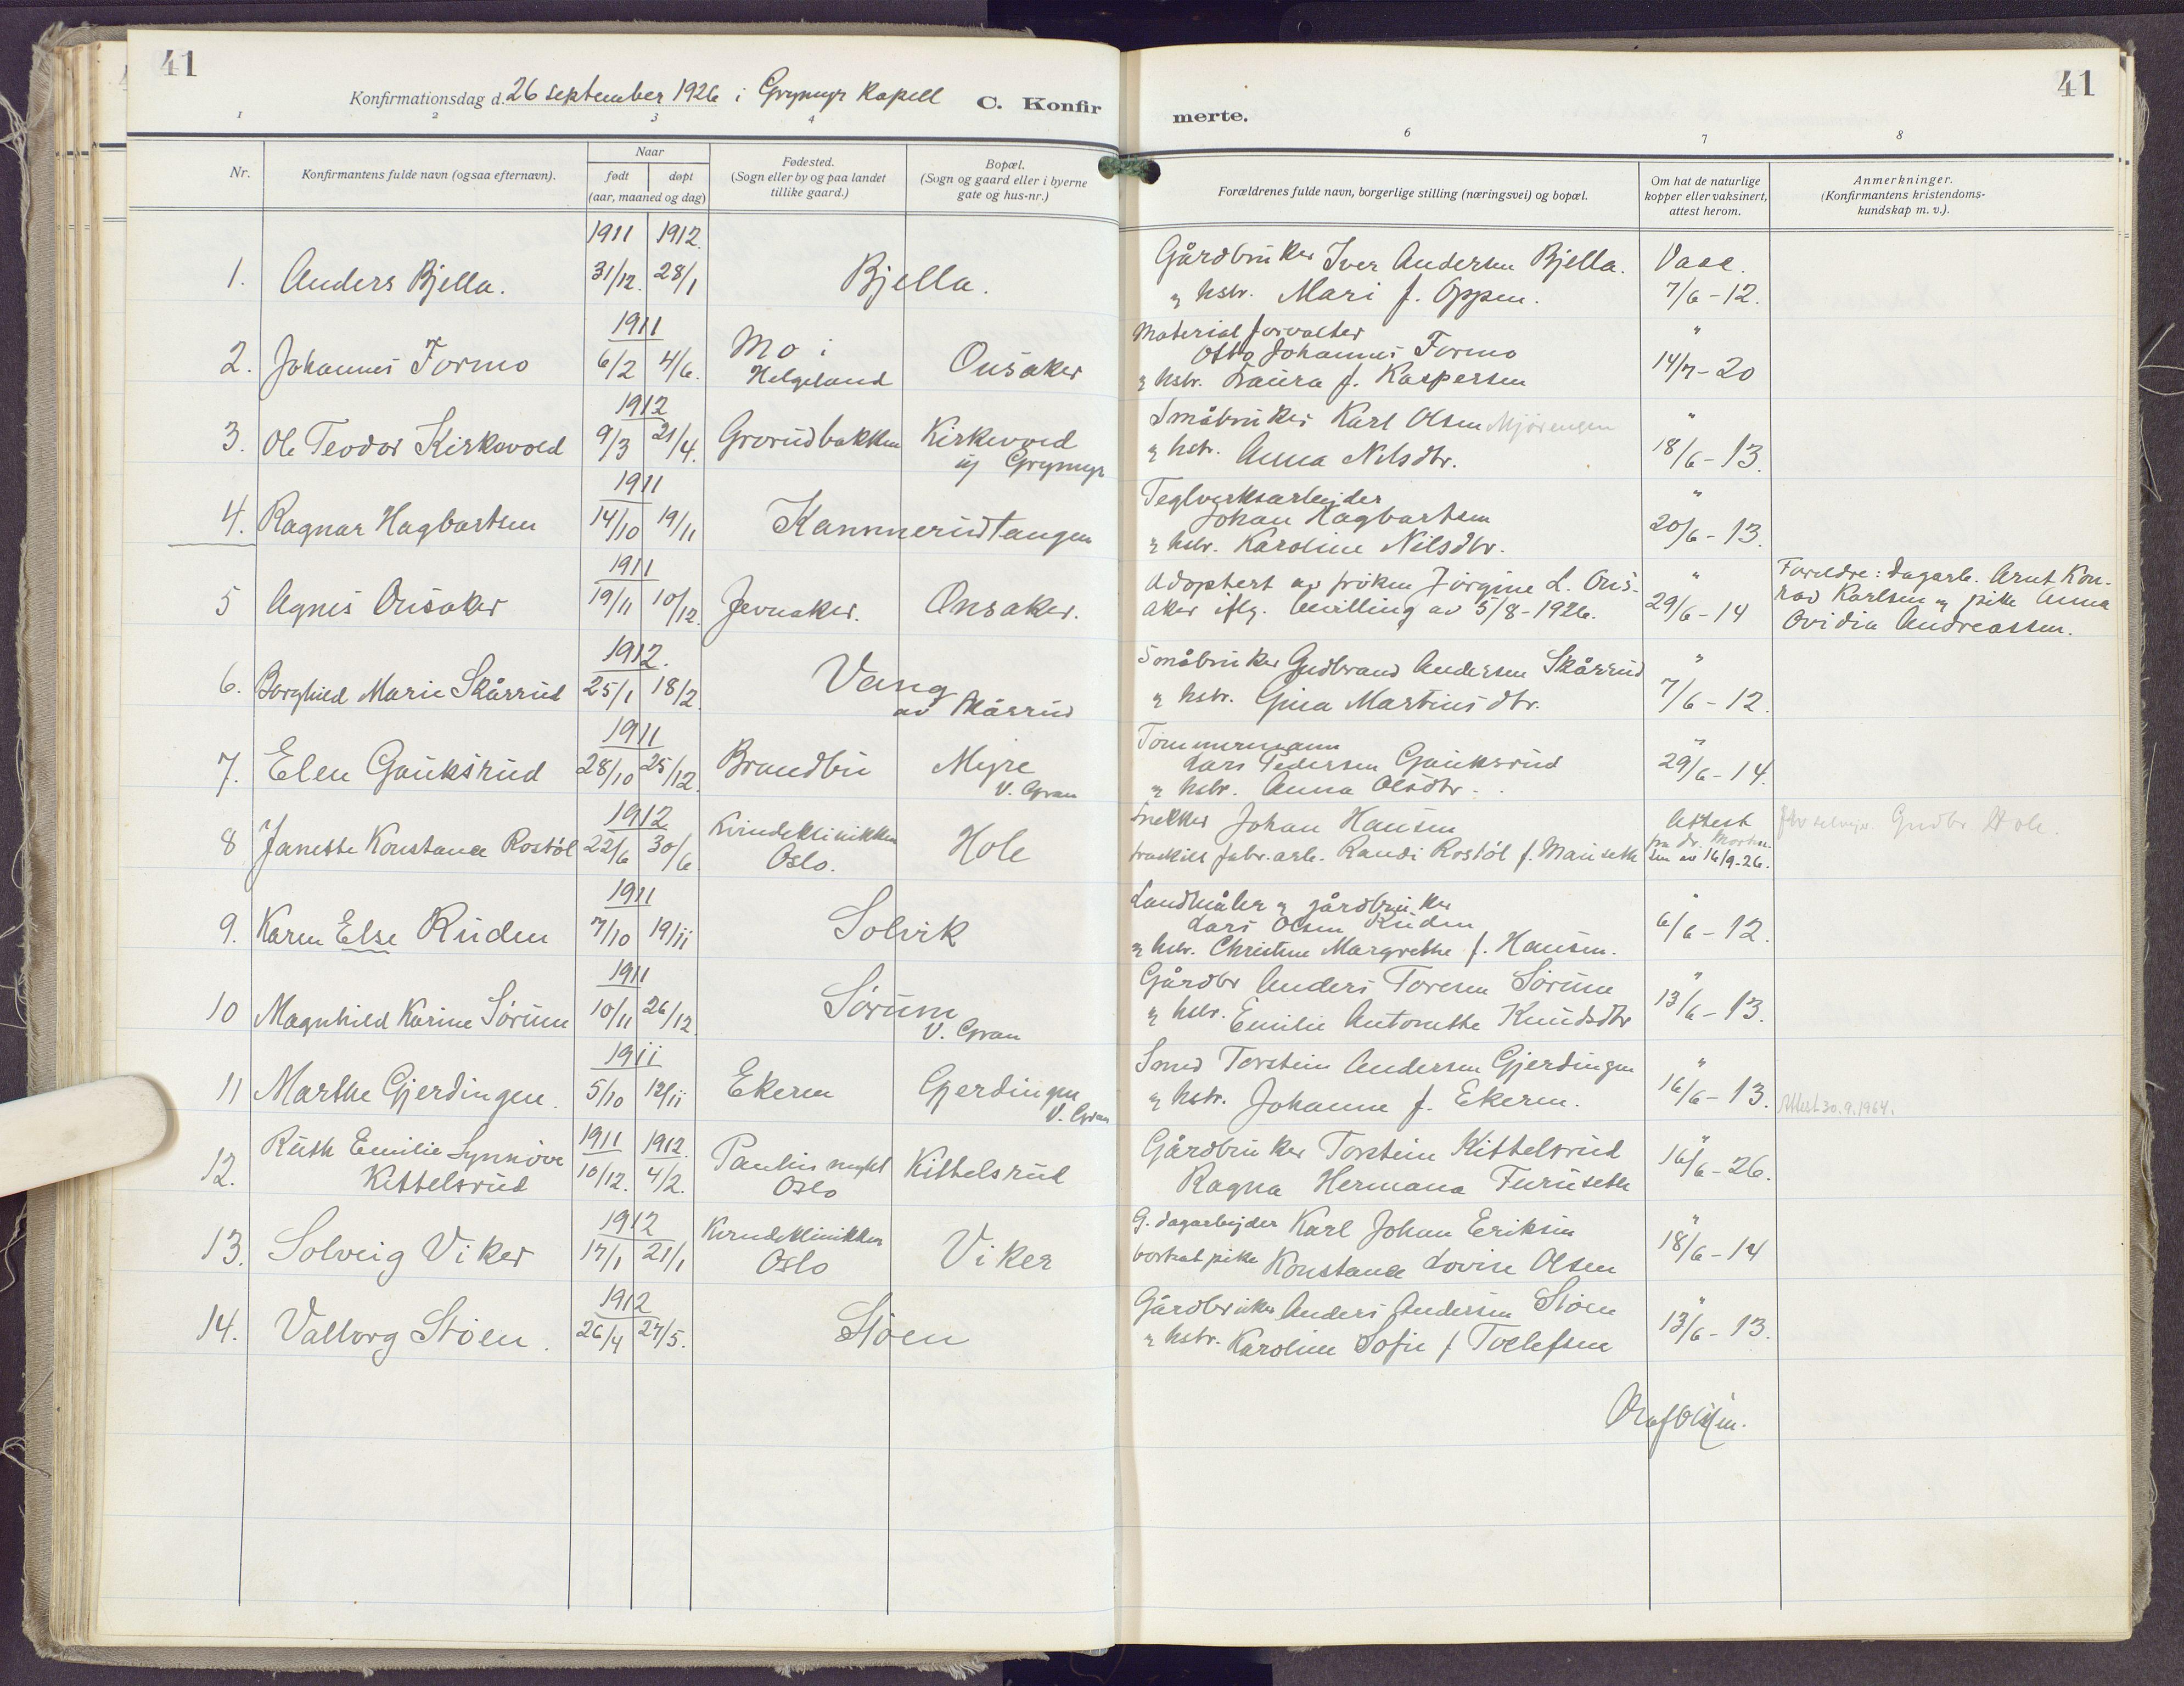 SAH, Gran prestekontor, Ministerialbok nr. 23, 1919-1938, s. 41